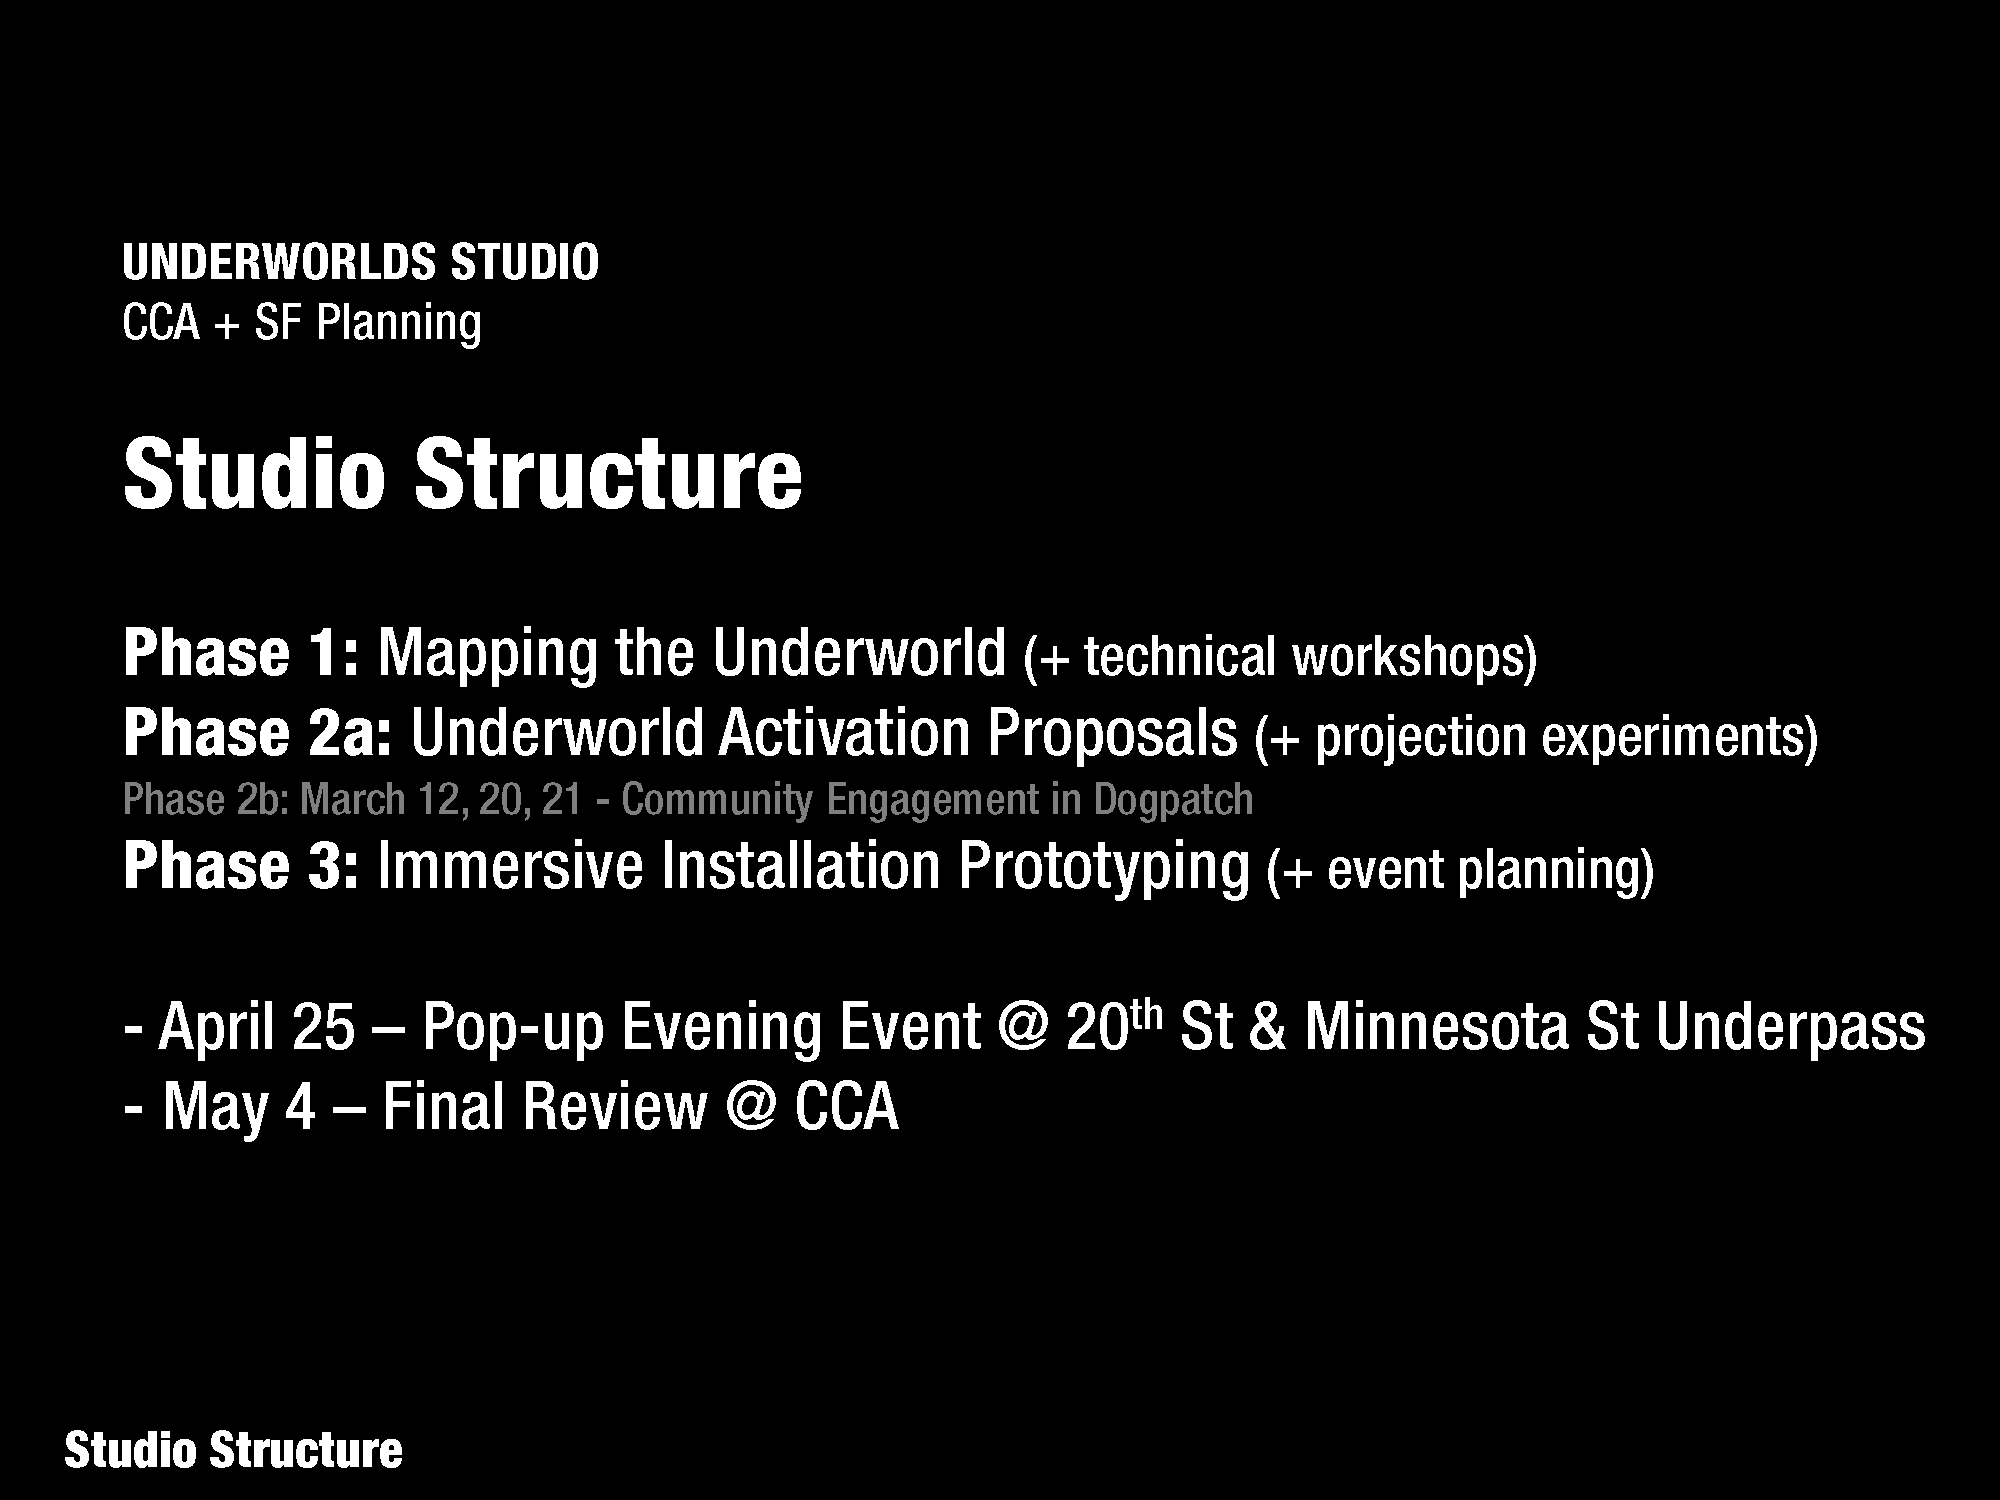 2019_Underworlds Studio Lottery Presentation_Page_37.png